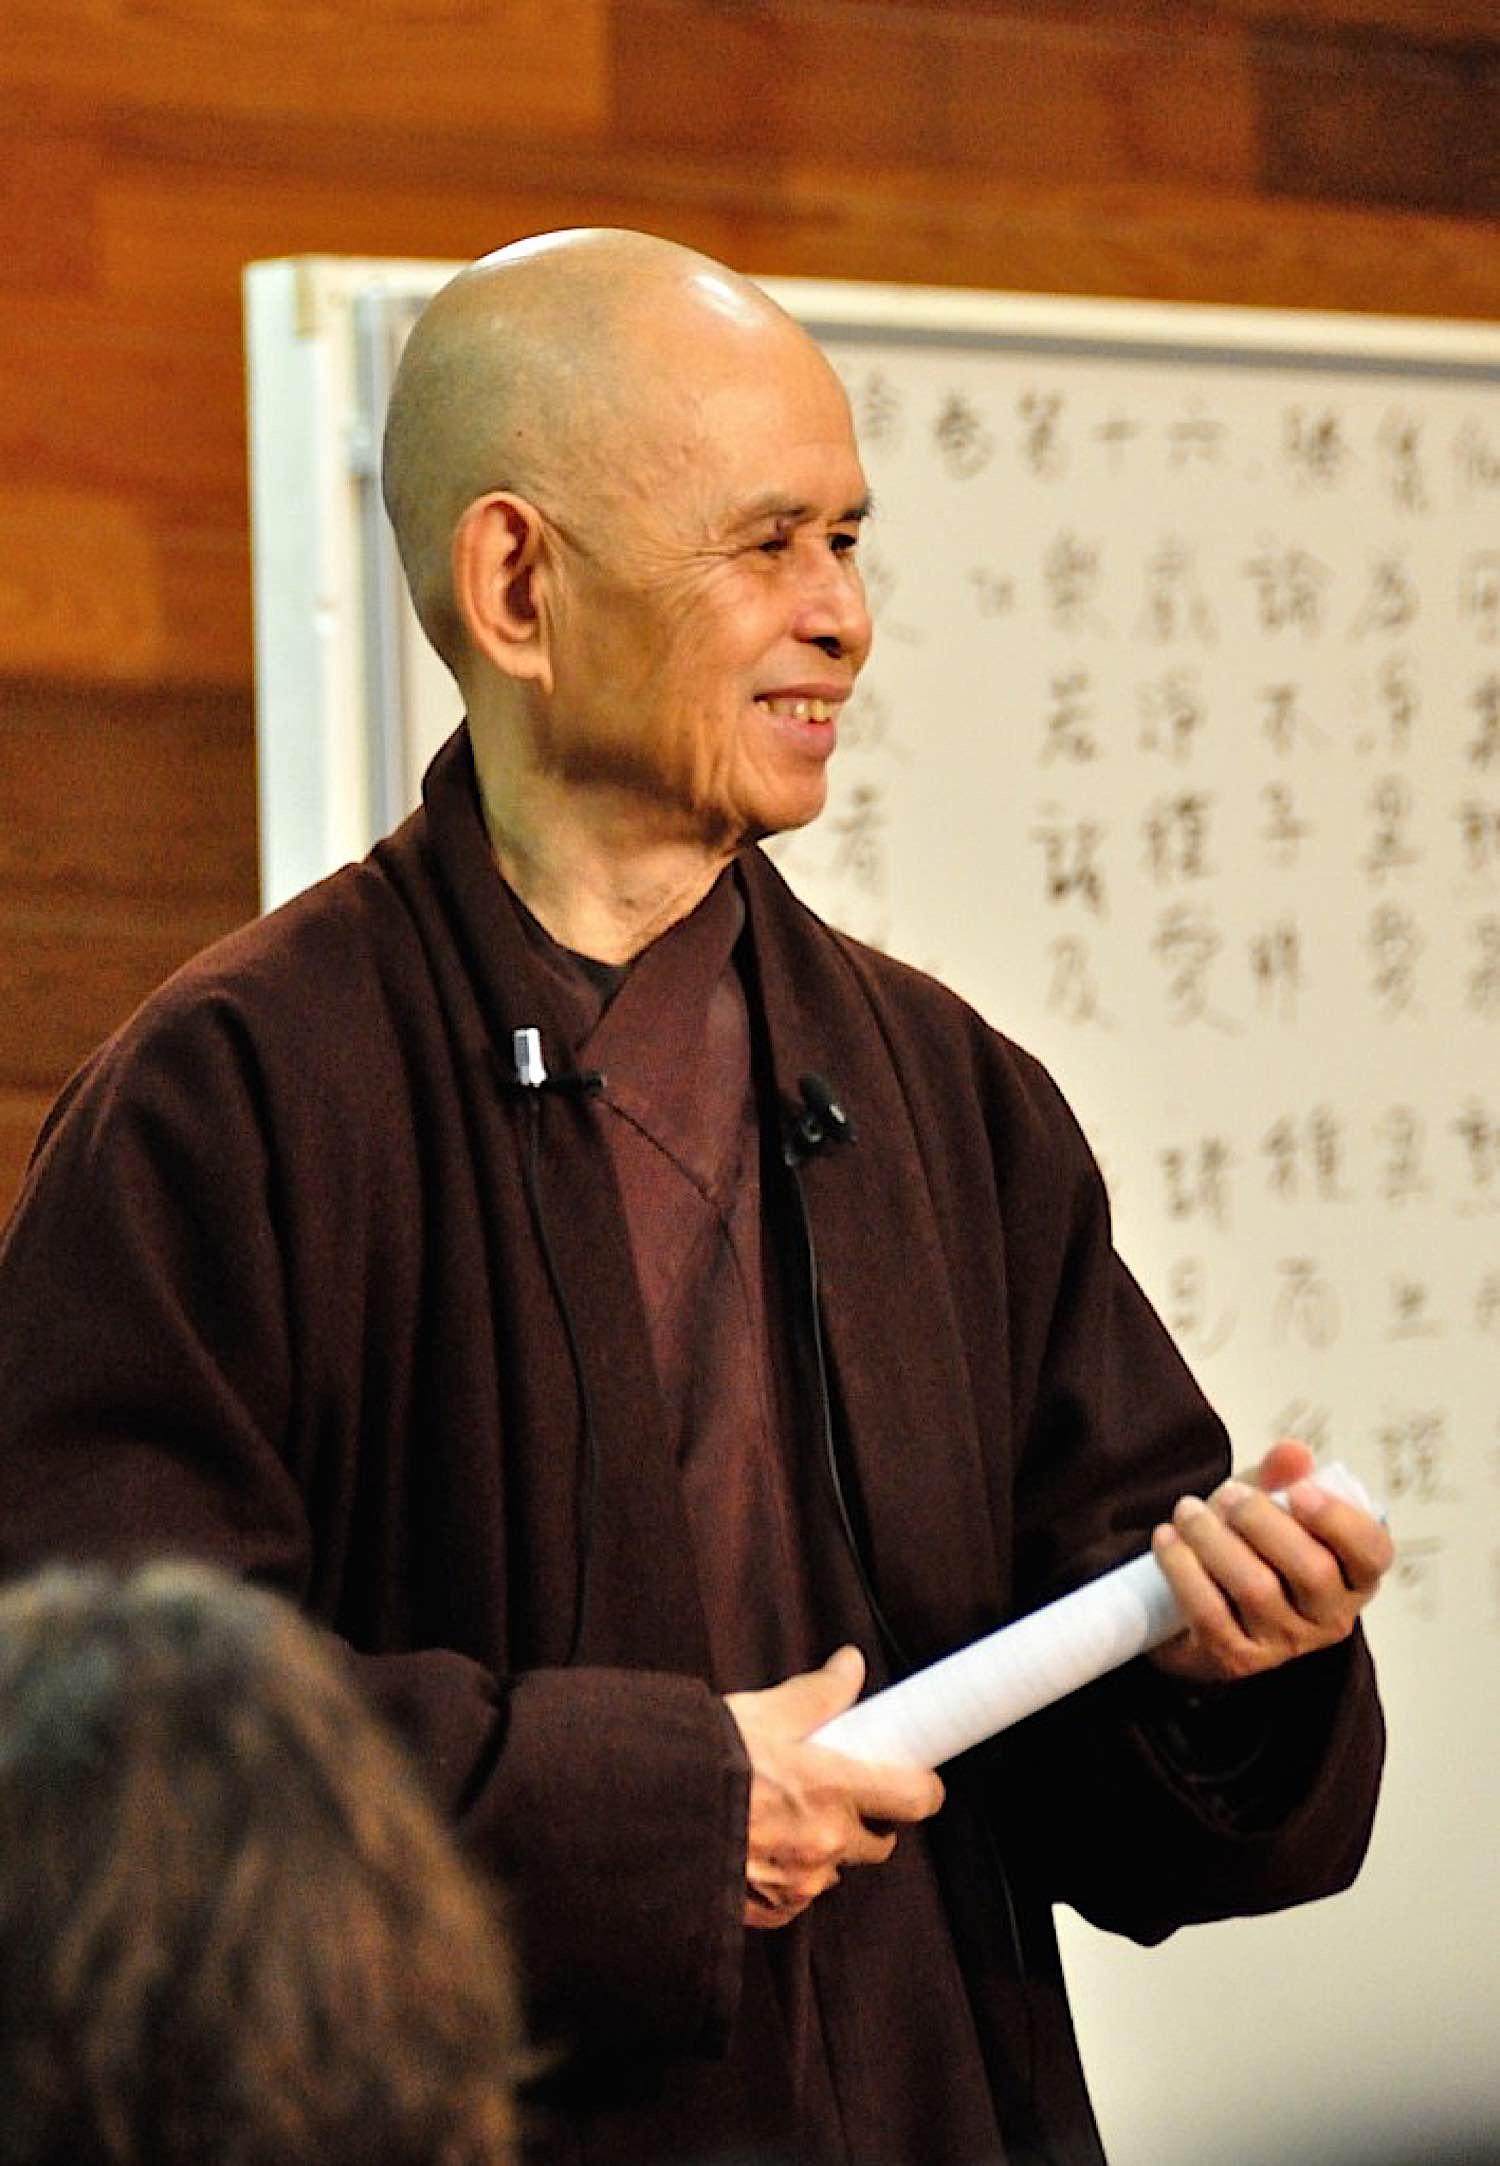 Buddha Weekly Thiay Thich Nhat Hanh teaching Photo Plum Village Buddhism